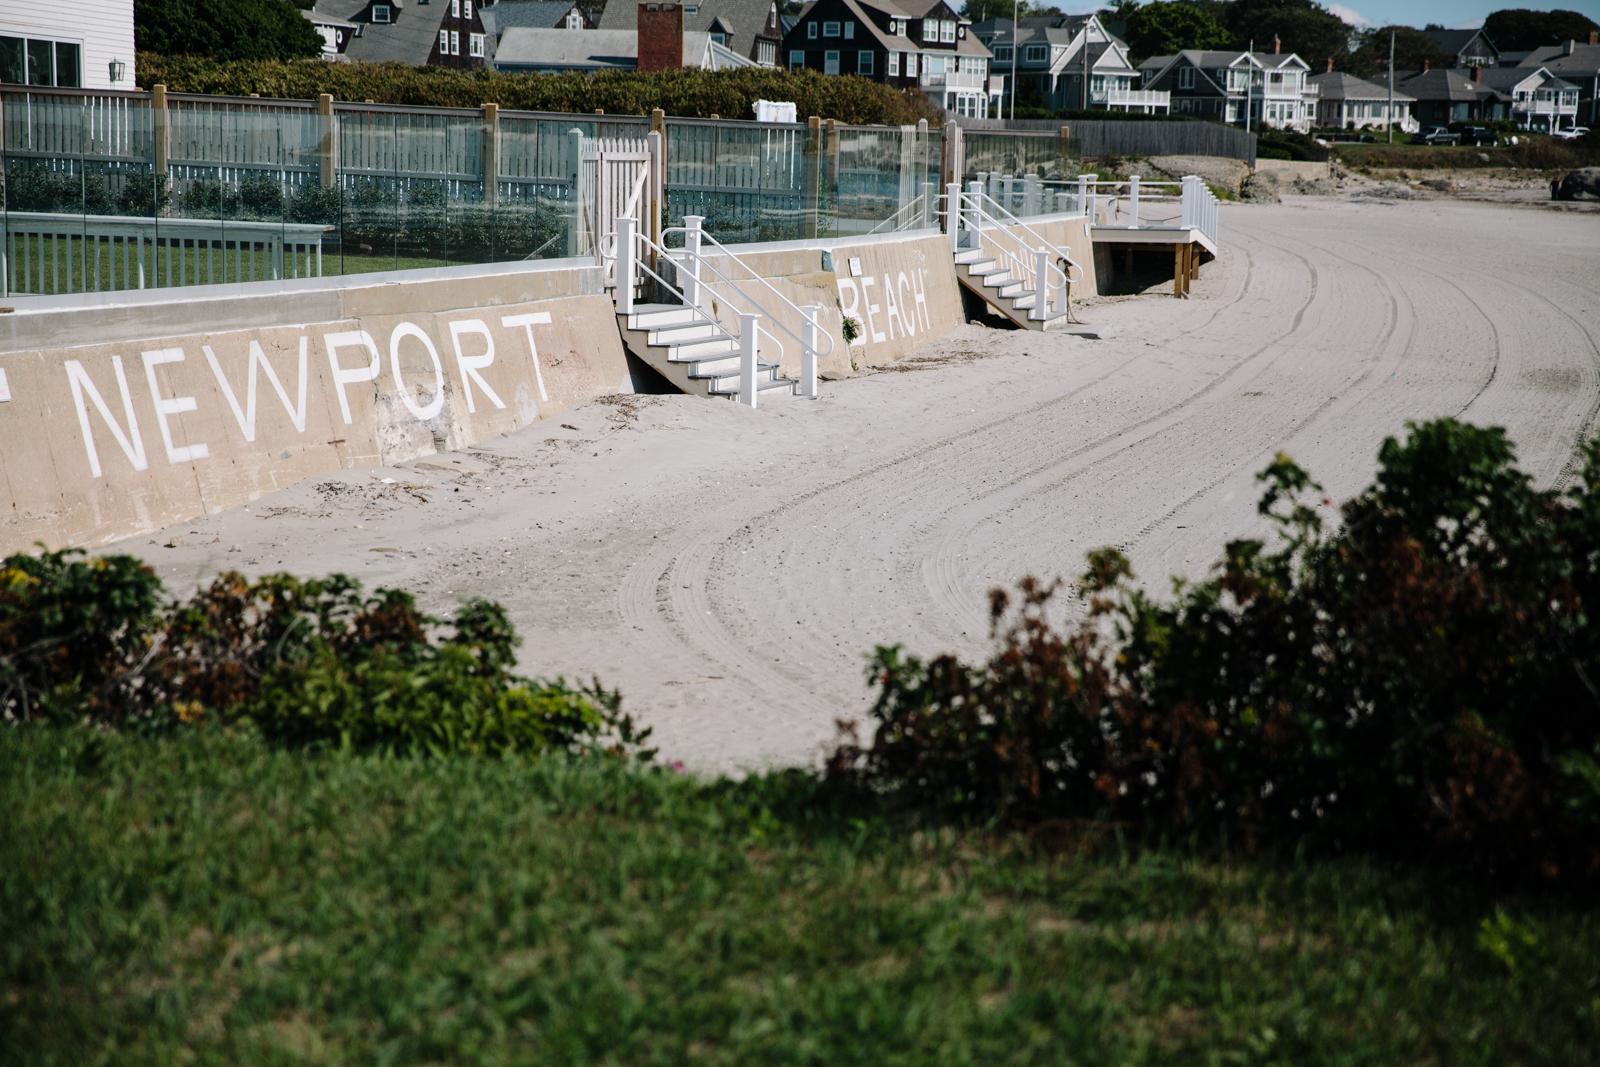 Eastons-Beach-Rotunda-Ballroom-Wedding-Newport-Rhode-Island-PhotographybyAmandaMorgan-5.jpg